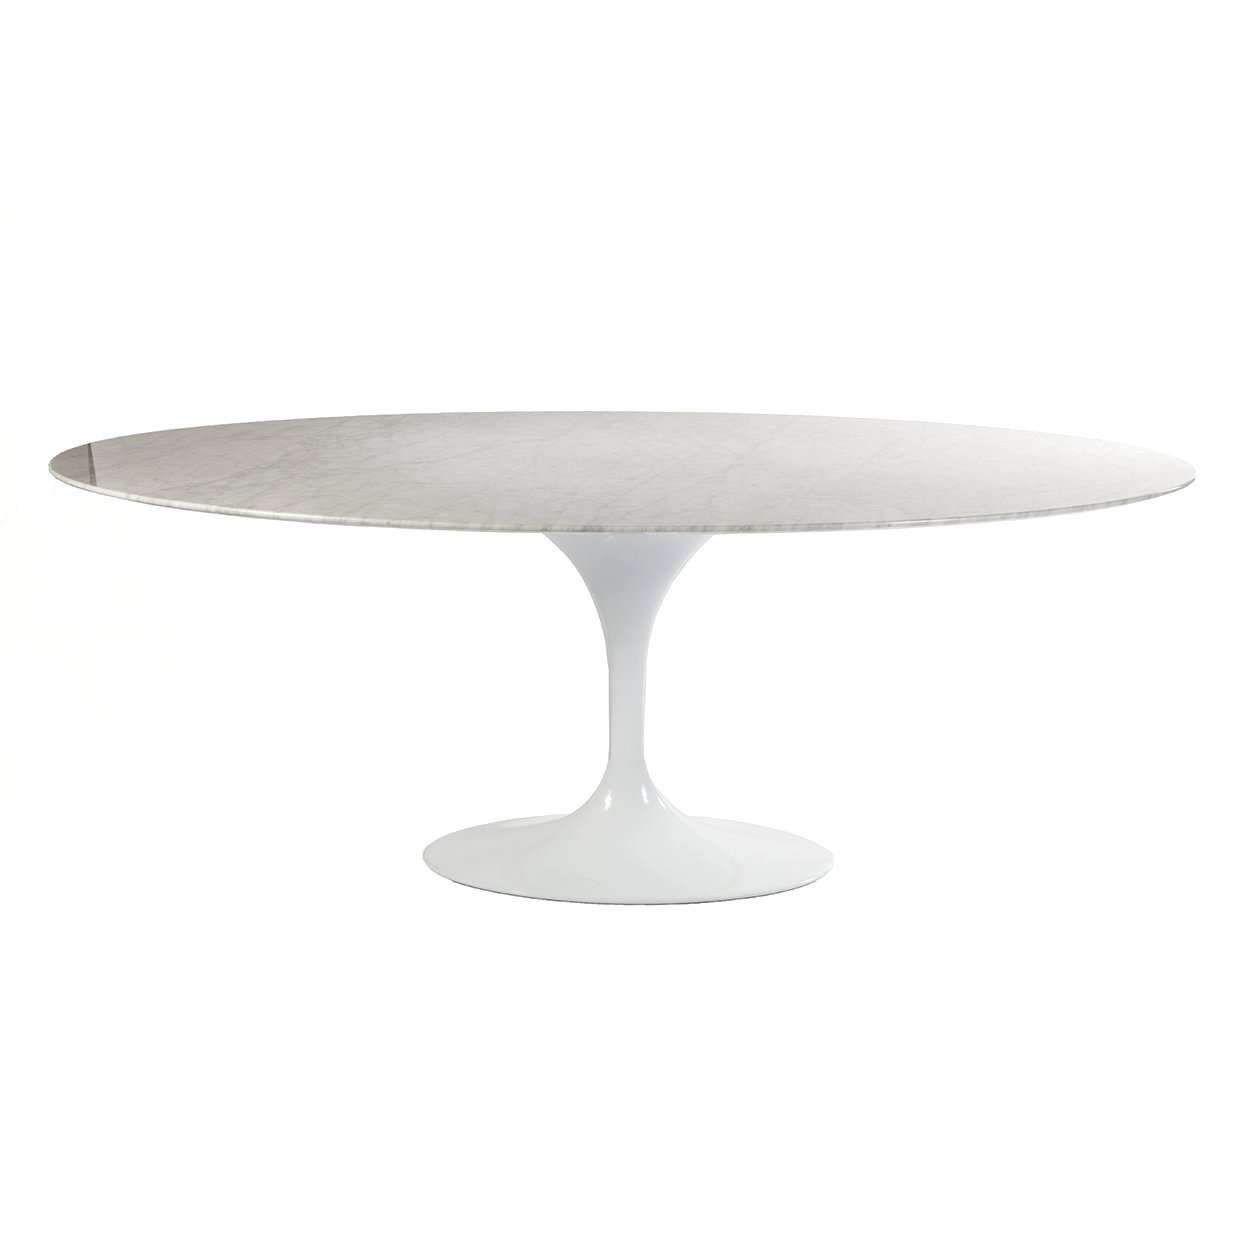 Carrara Marble Tulip Dining Table 79 Ovaldefault Title Tulip Dining Table Marble Dining Pedestal Dining Table [ 1250 x 1250 Pixel ]